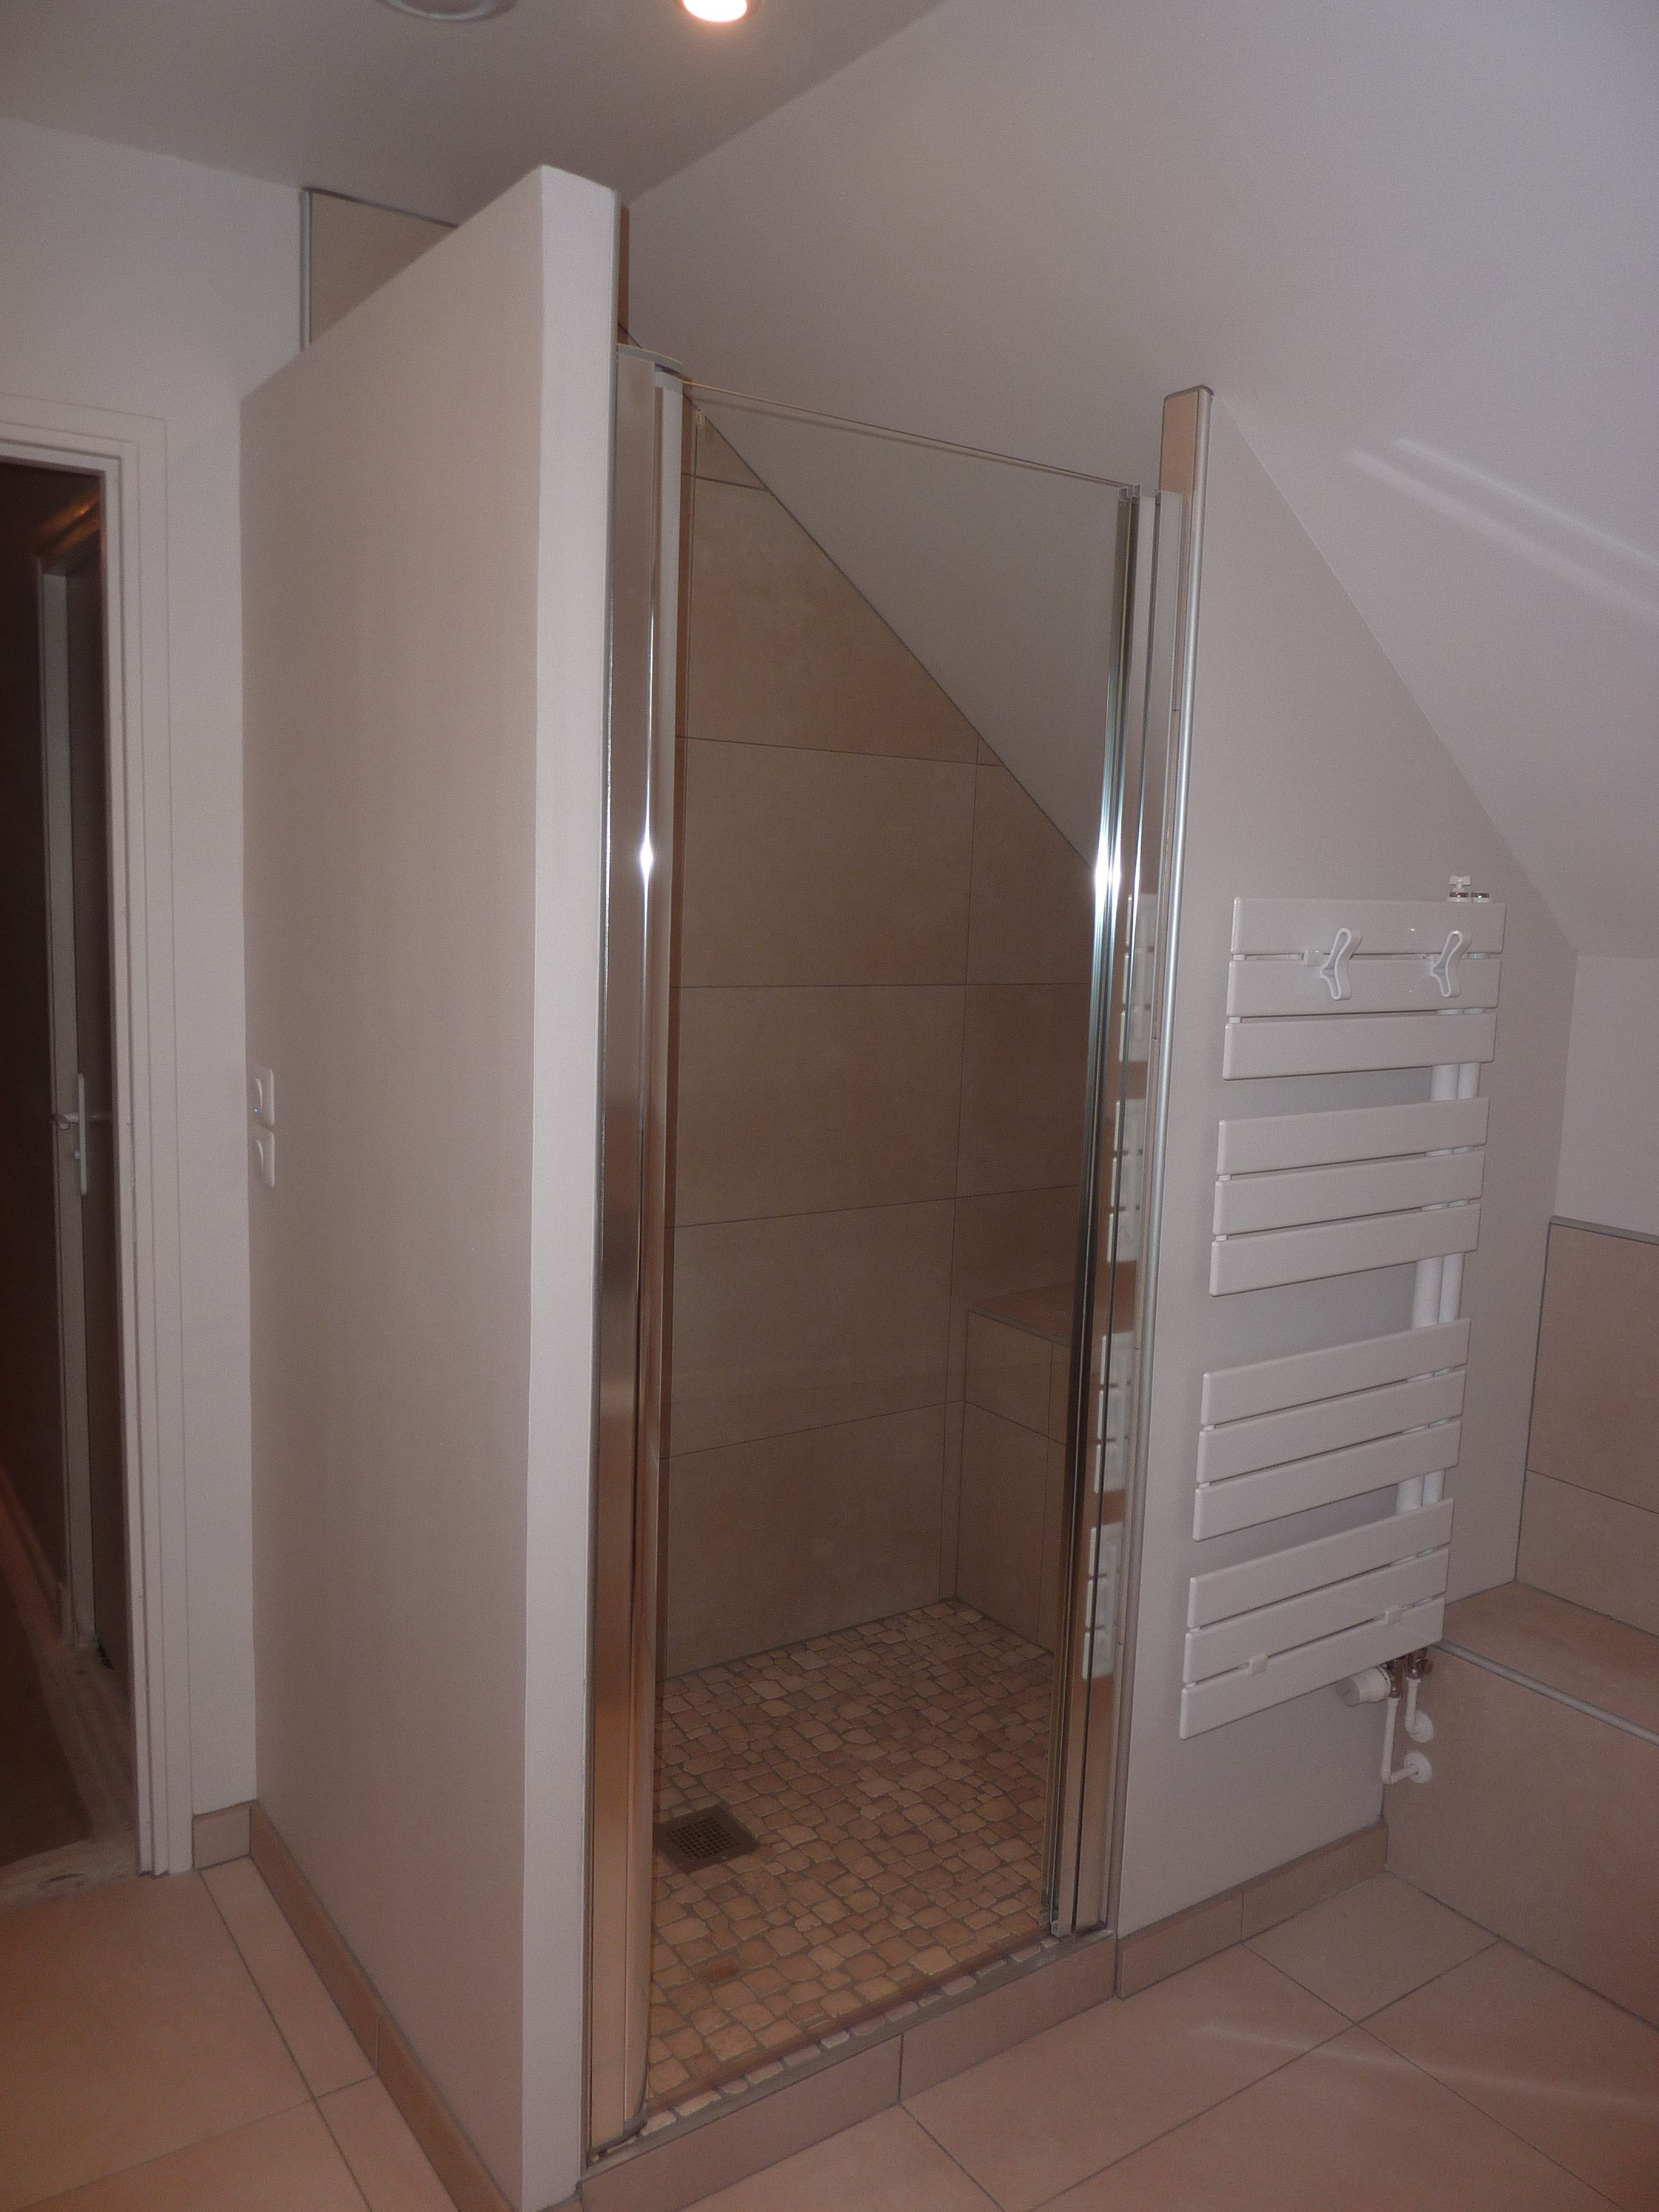 douche - porte serviette - rebord | future salle de bains ...